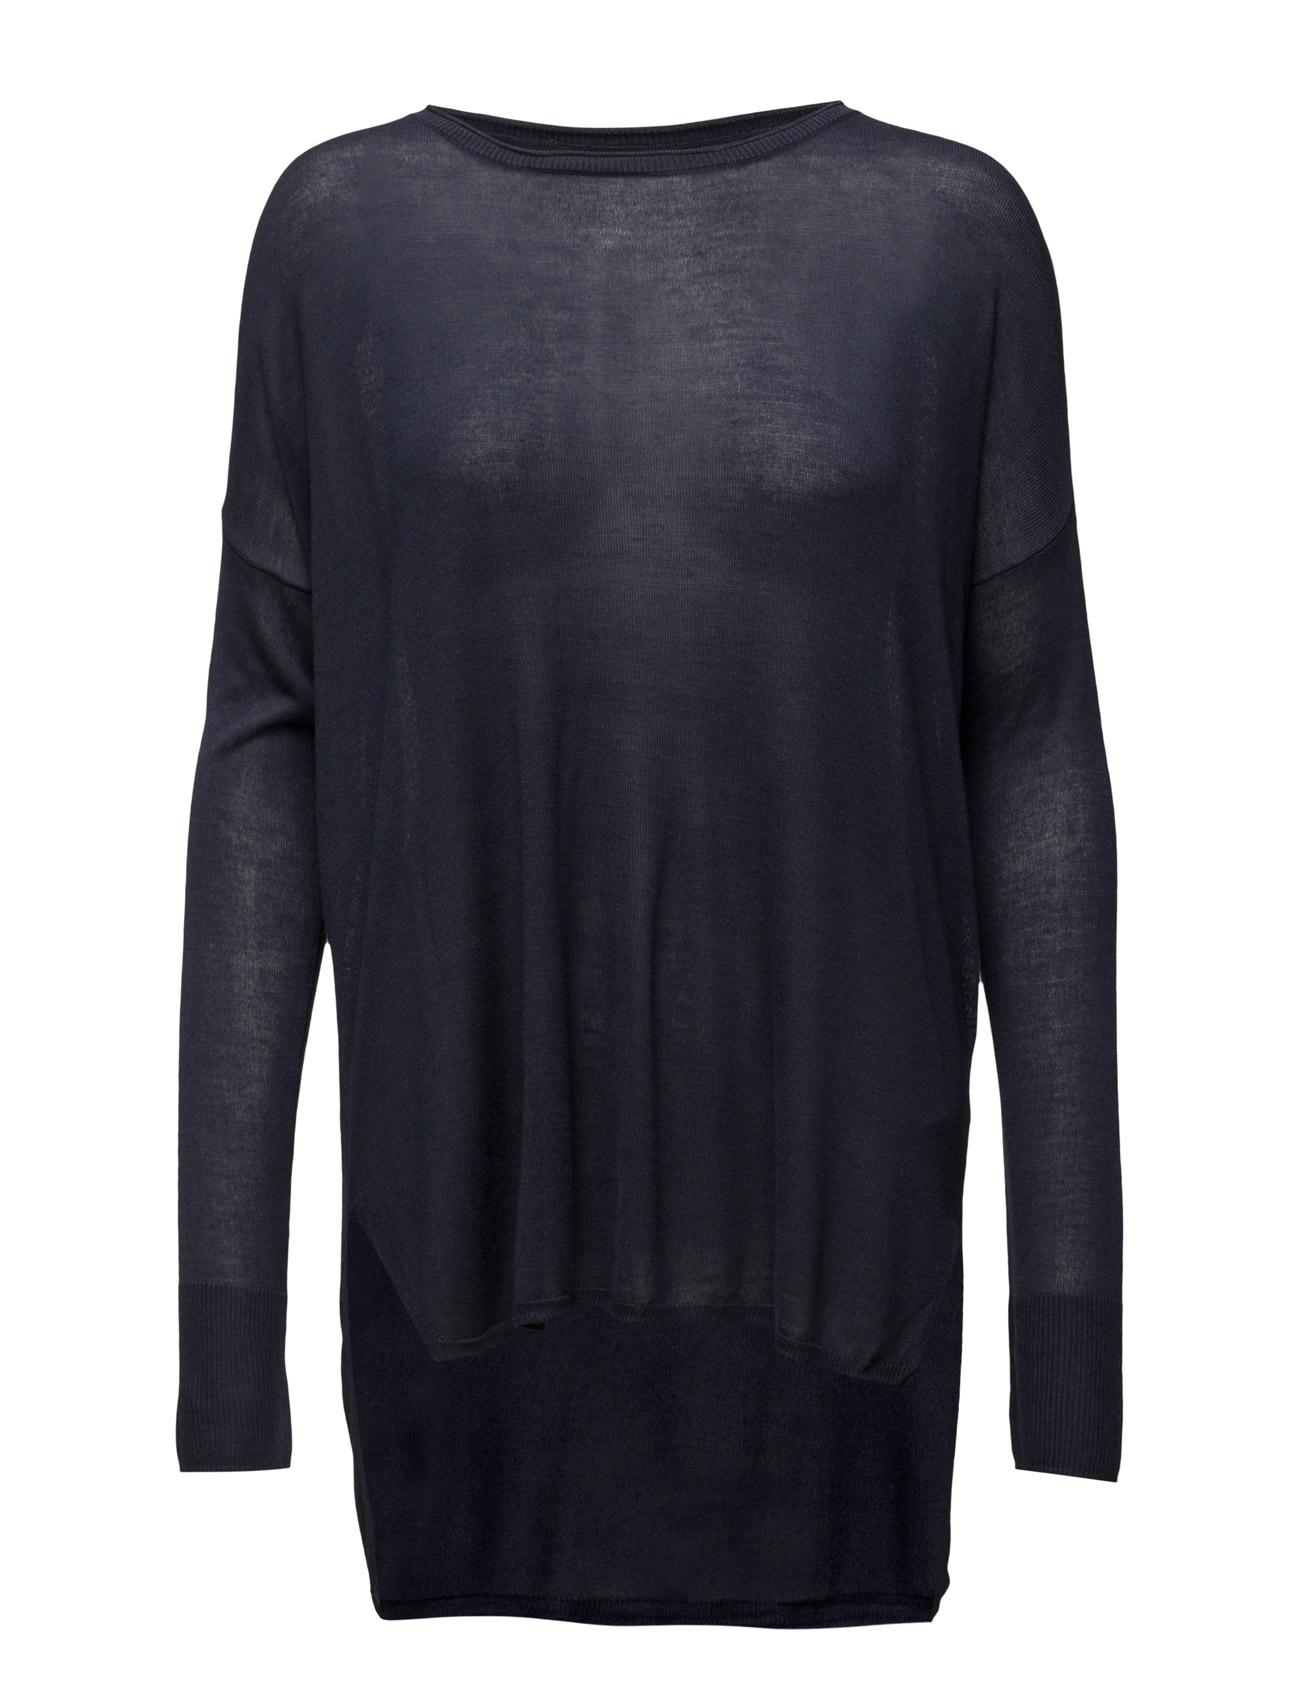 Blouse W Rib Sleeve Detail Saint Tropez Sweatshirts til Damer i P.Night